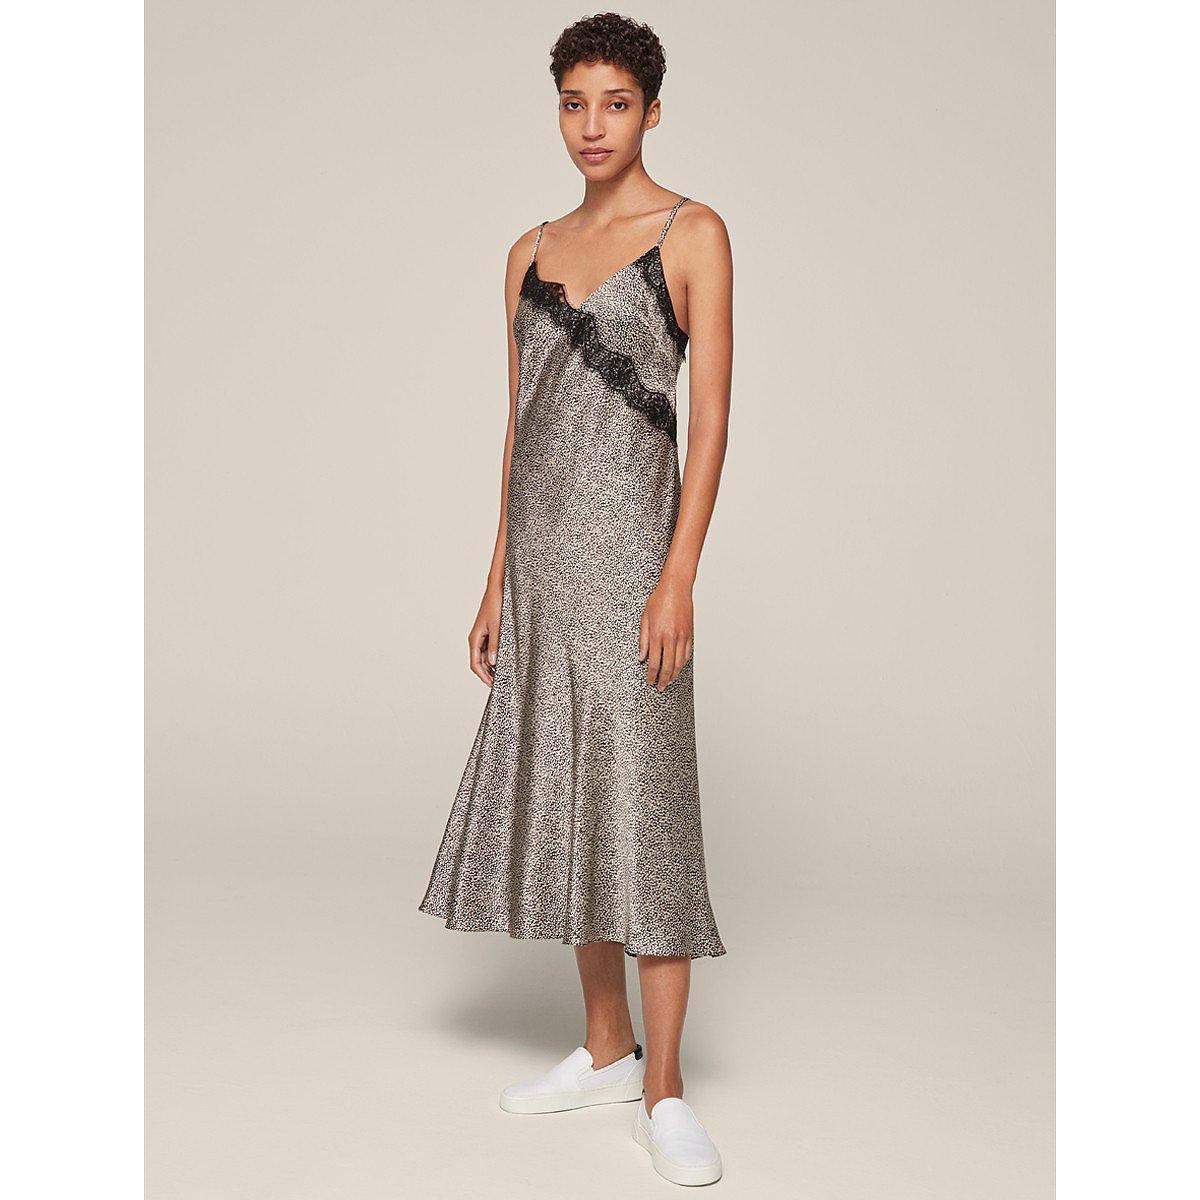 ME+EM Silk Leaf Print Bias Cut Dress